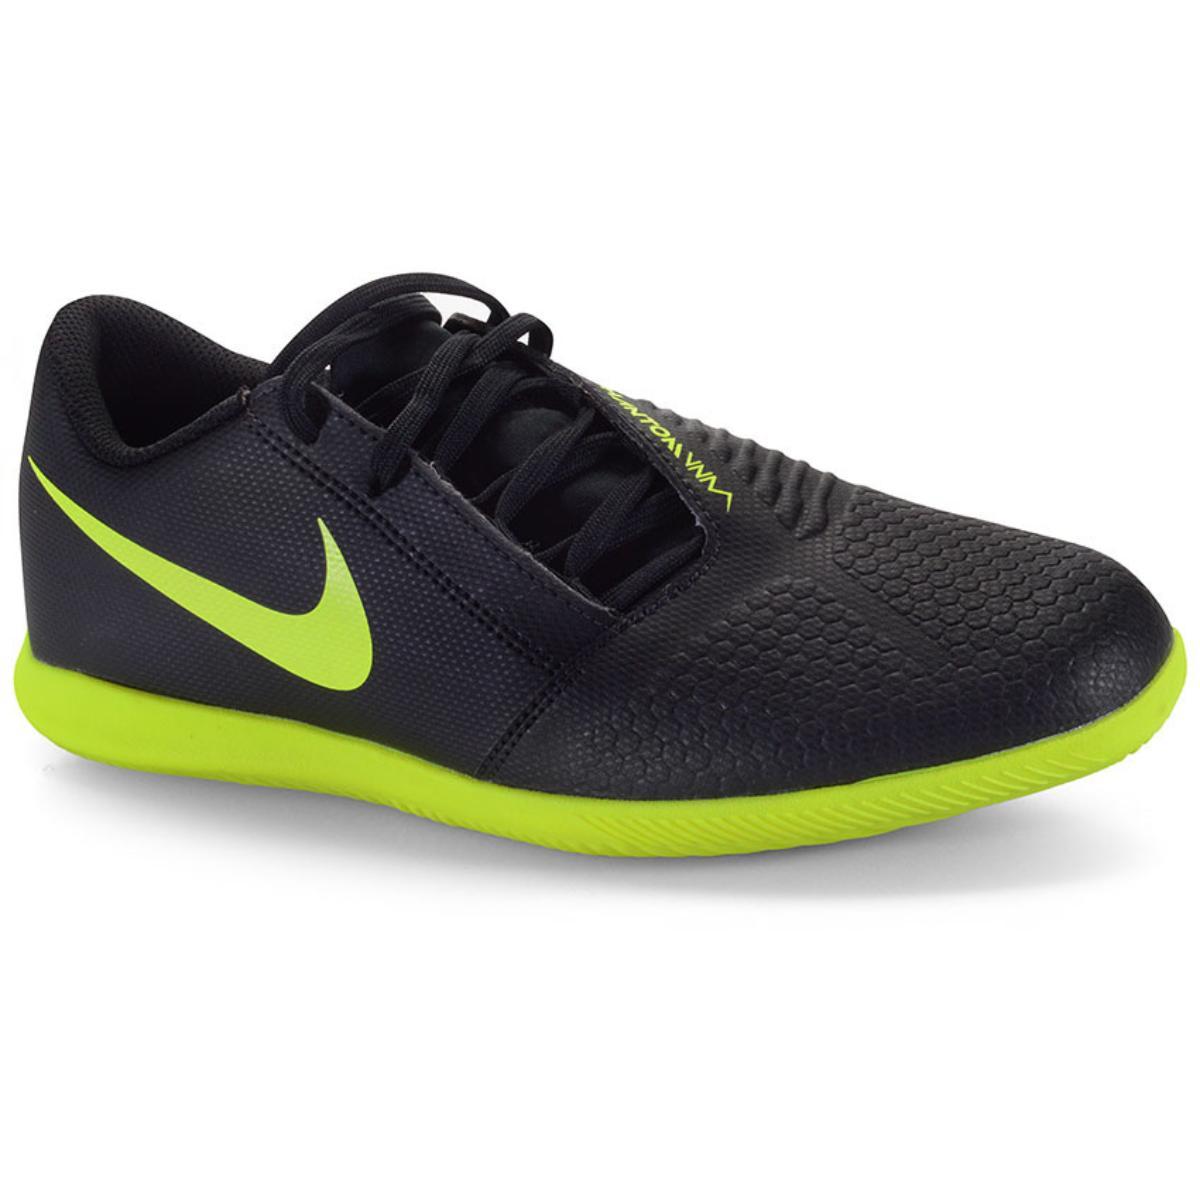 Tênis Masculino Nike Ao0578-007 Phanton Venom Club ic Preto/limão